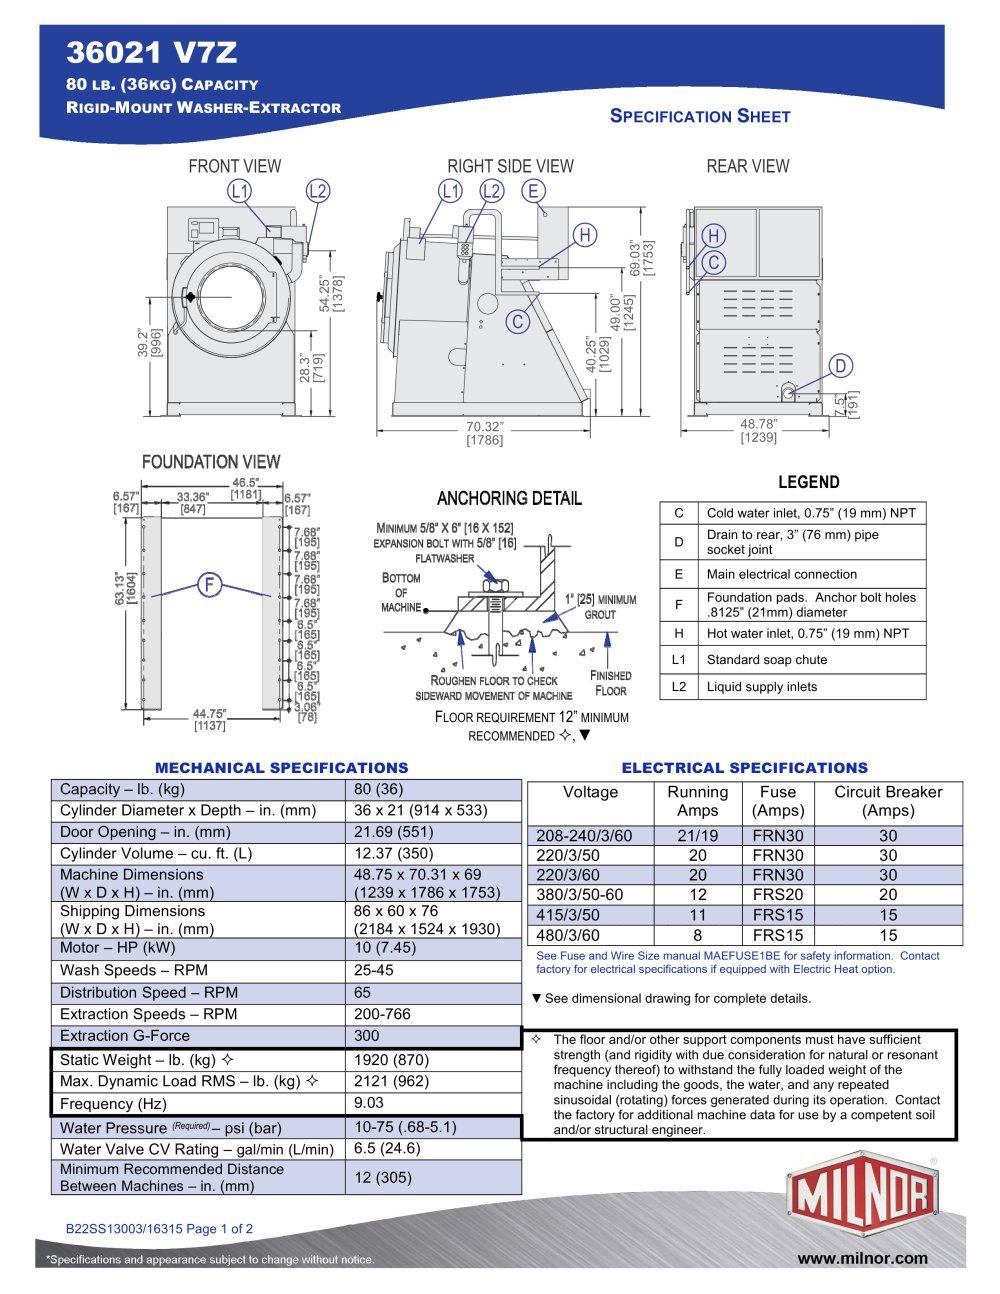 36021v7z Milnor Pdf Catalogues Documentation Brochures Dryer Wiring Diagram 1 2 Pages